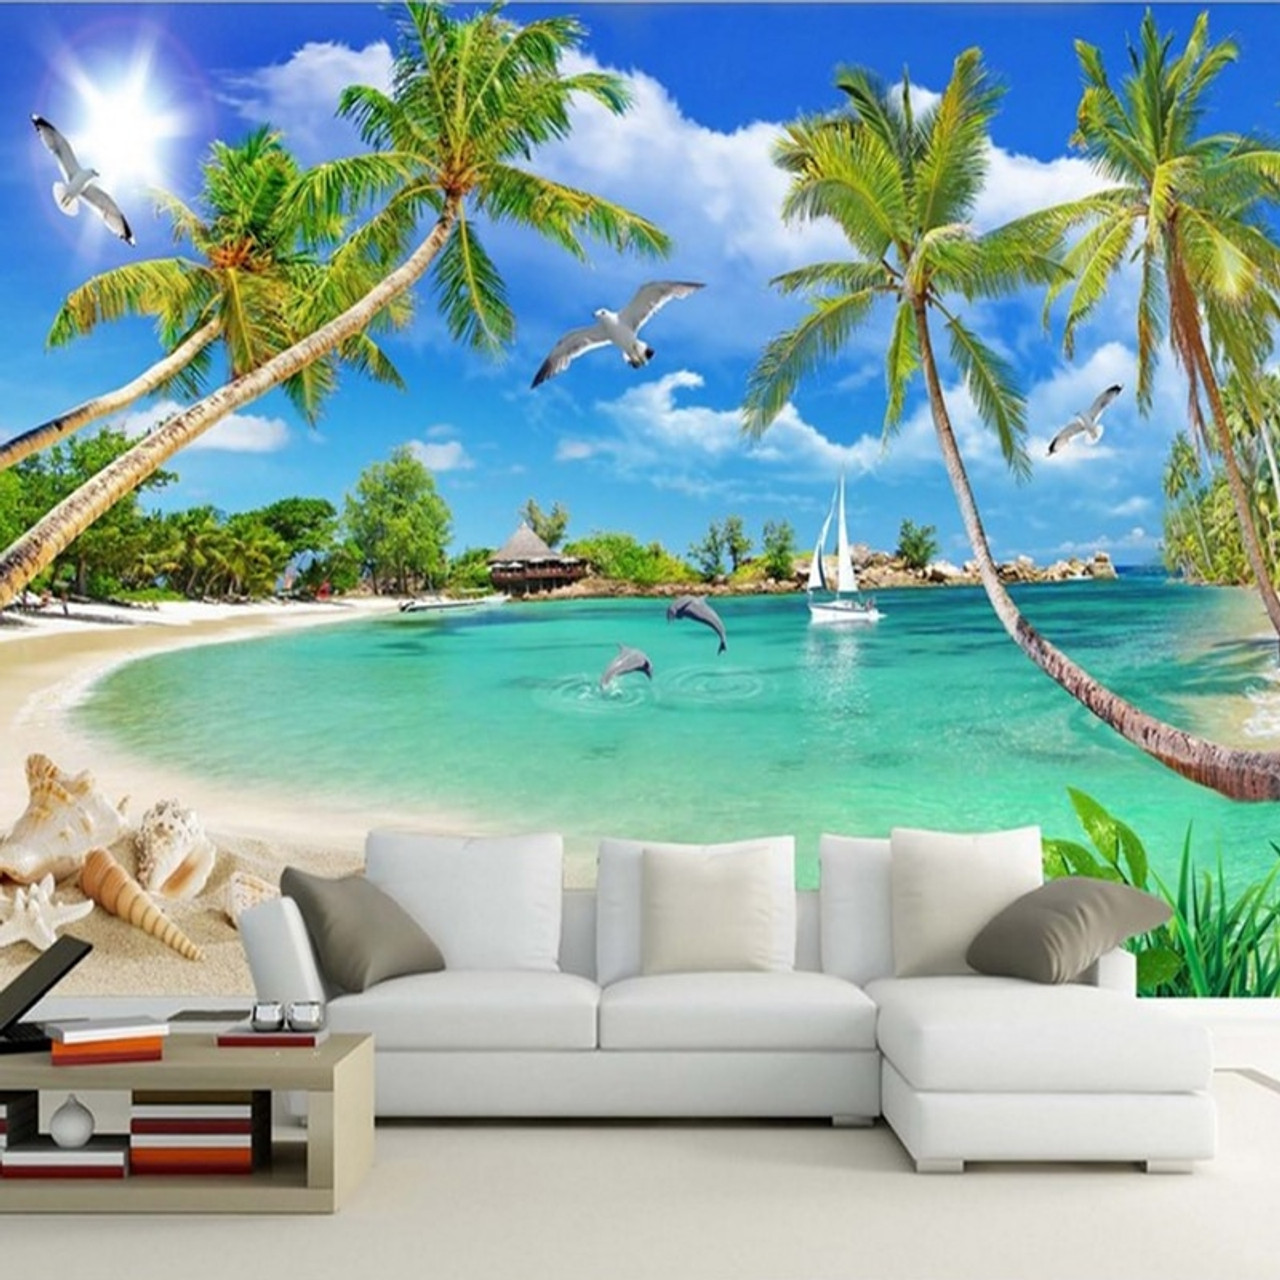 Youman Custom 3d Photo Wallpaper Wall Murals 3d Wallpaper Summer Beach Trees Landscape Home Decor For Room Bedroom Living Room Onshopdeals Com